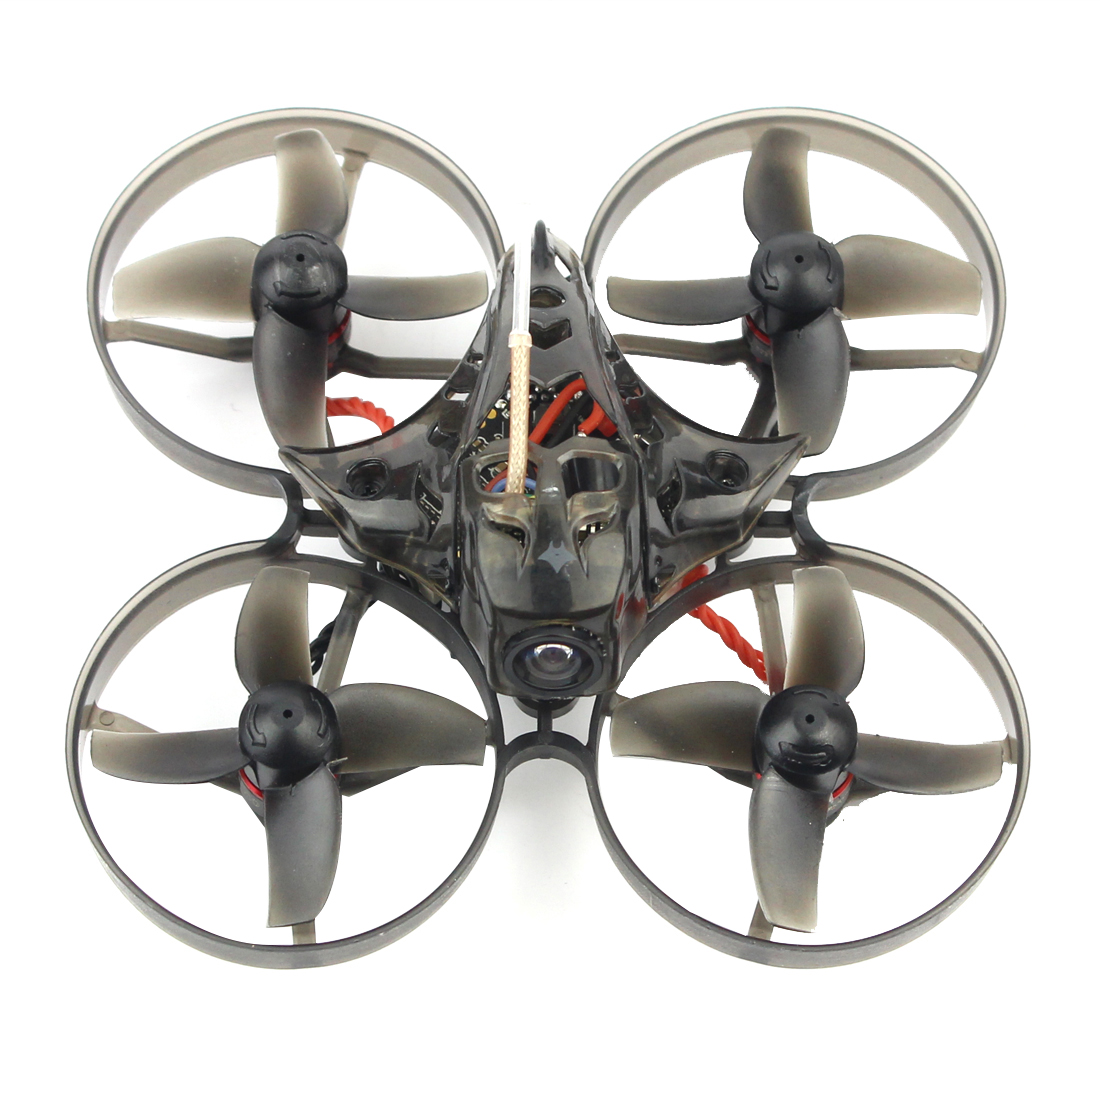 Mini Mobula7 75mm Crazybee F3 Pro OSD 2 S RC FPV Racing Drone Quadcopter w/Upgrade BB2 ESC 700TVL BNF Kompatibel Frsky Flysky